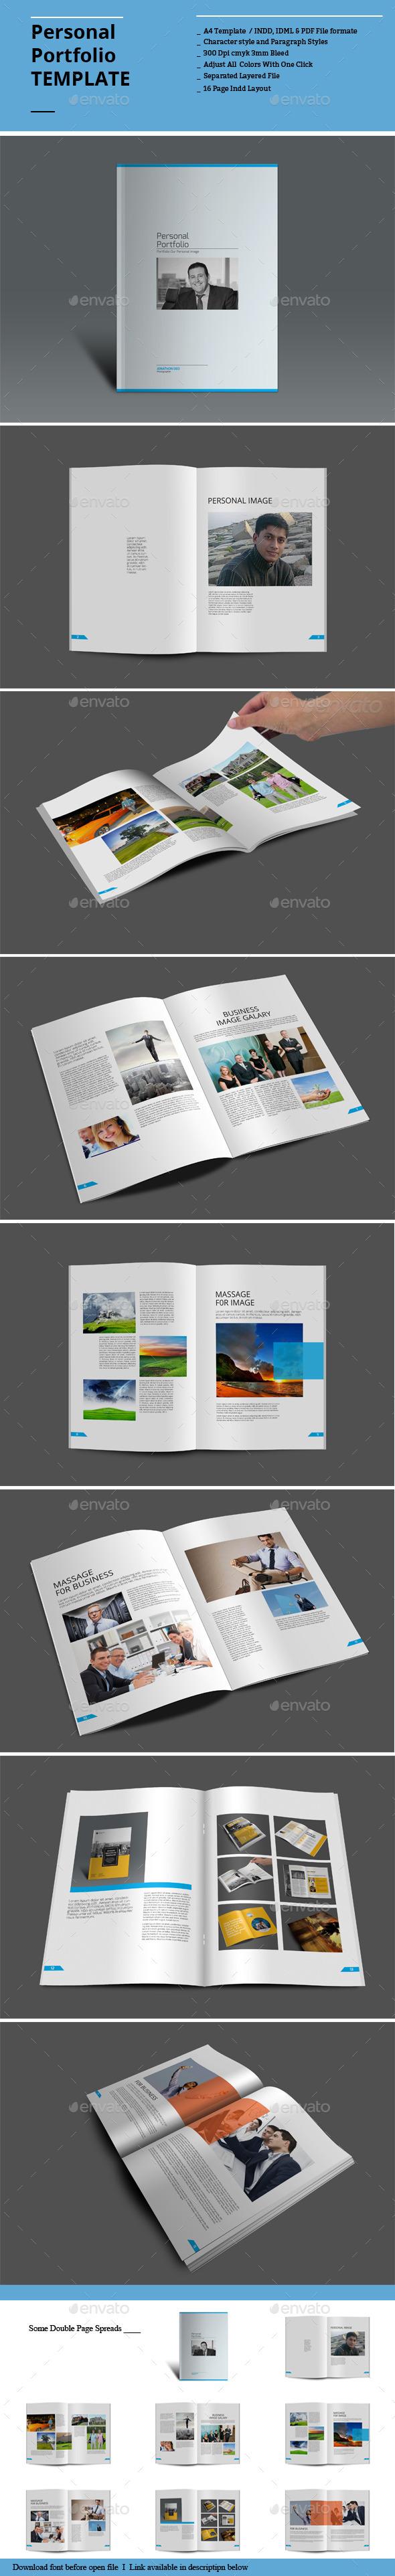 Personal Portfolio Templates - Portfolio Brochures